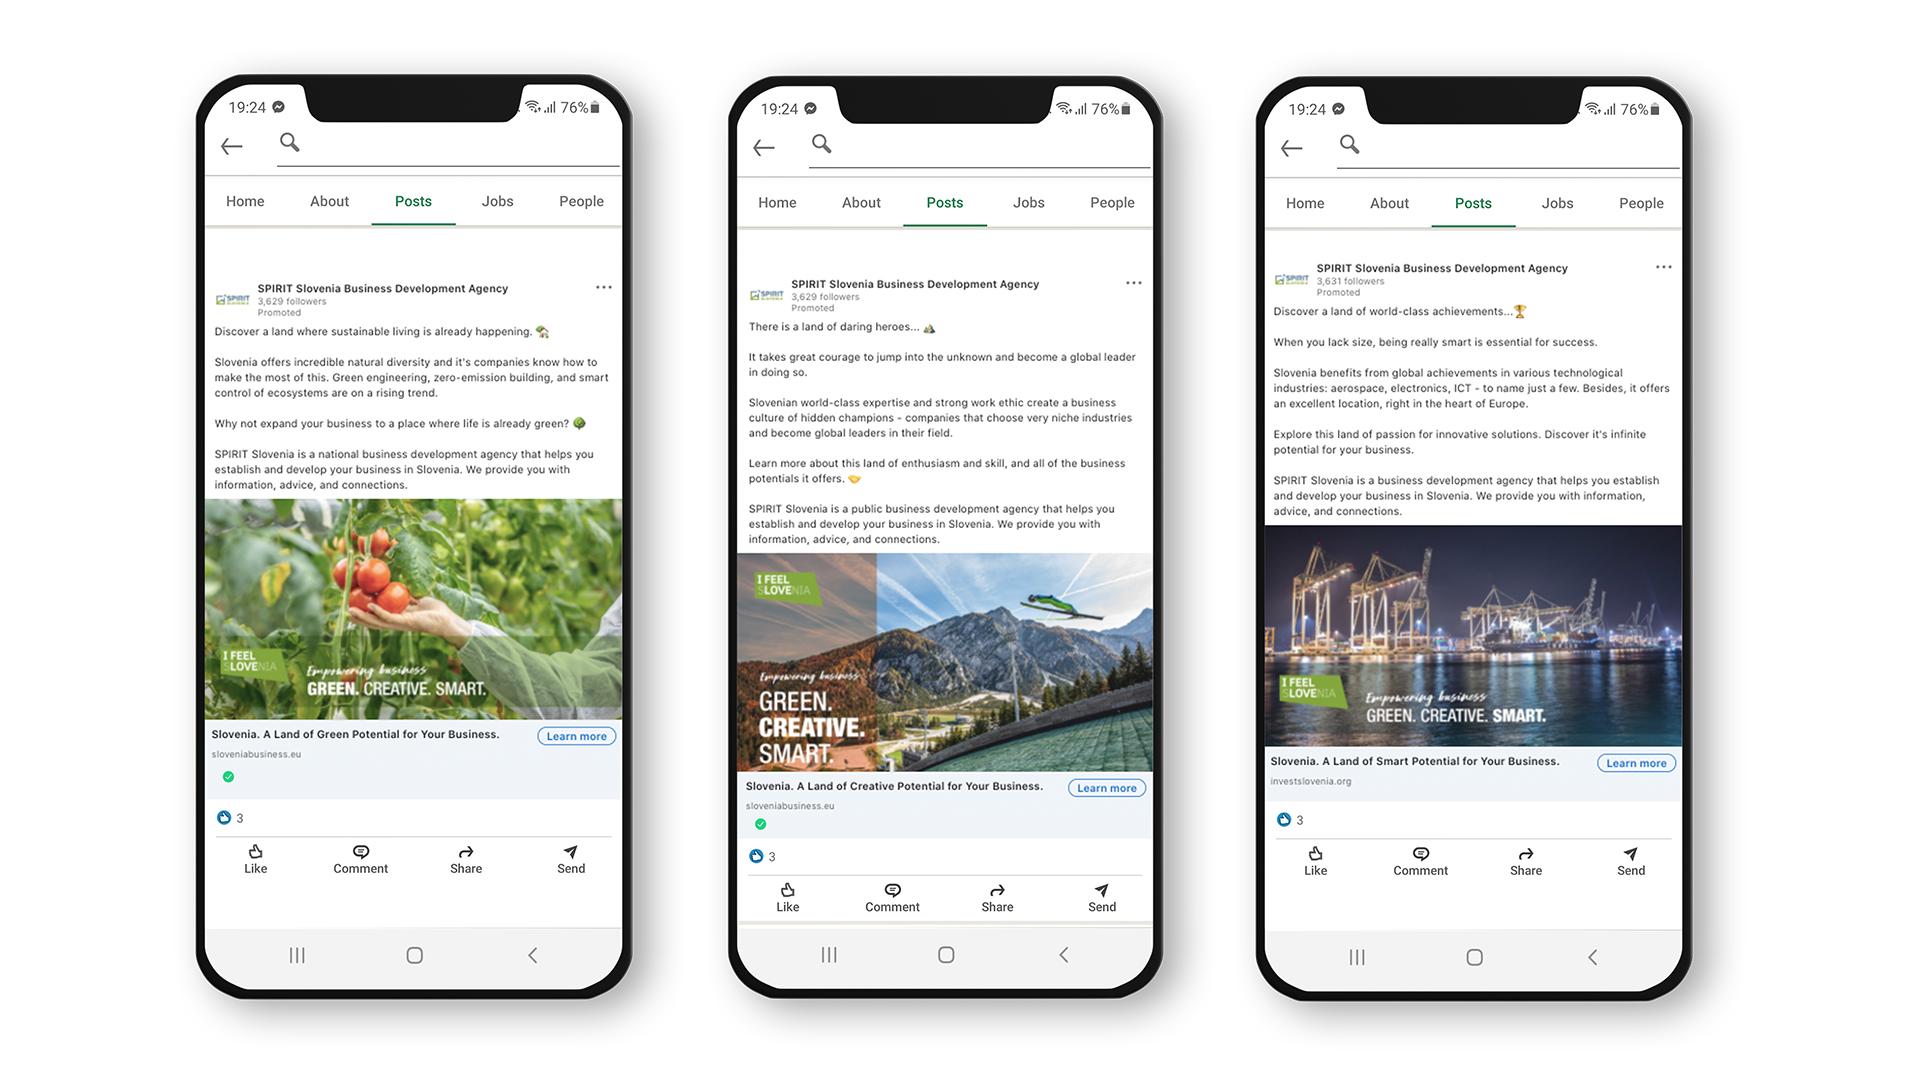 Green. Creative. Smart.: LinkedIn oglasi